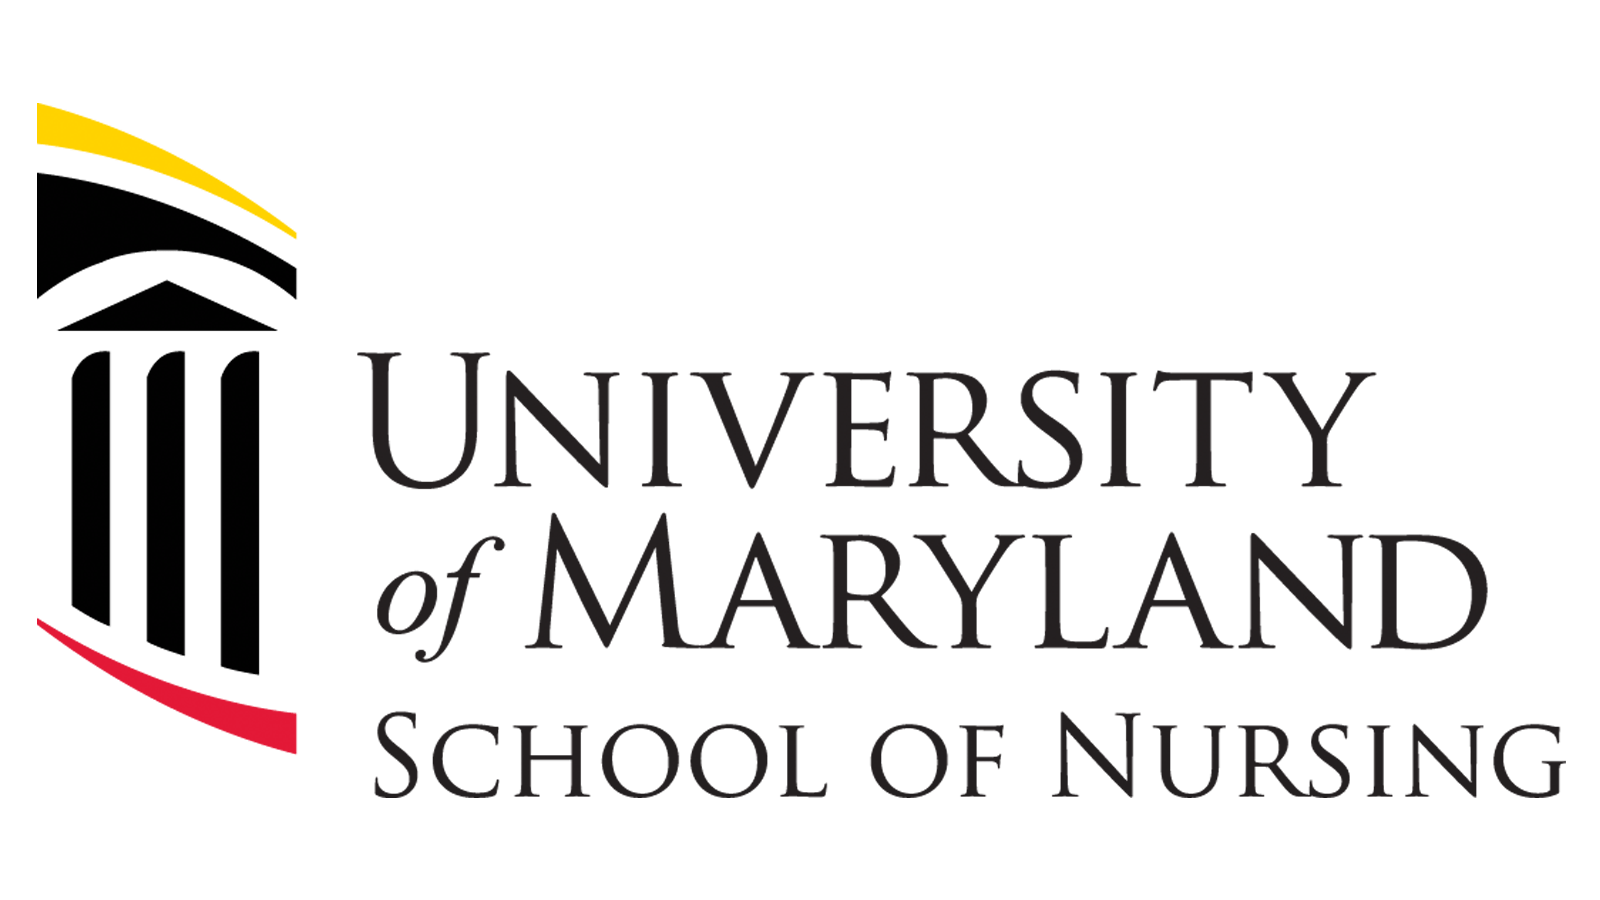 University of Maryland School of Nursing offers dual